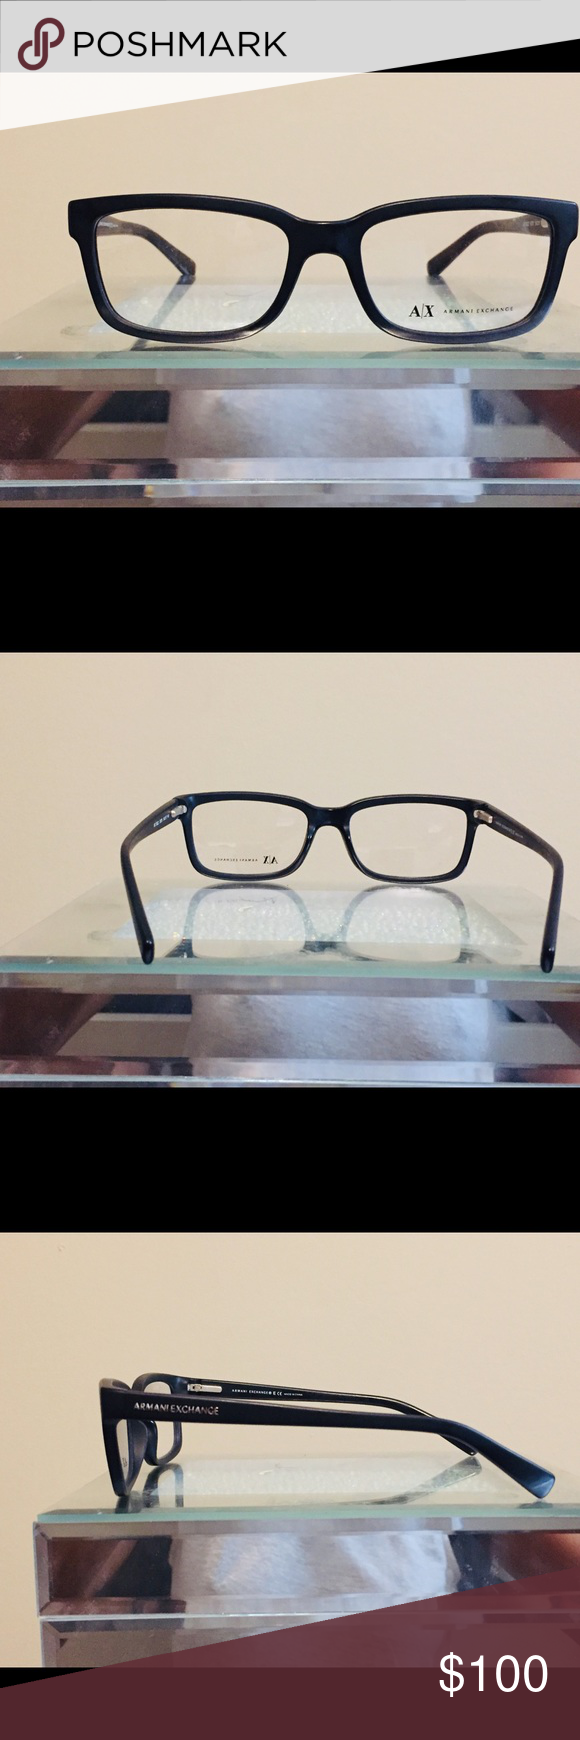 783226fc8c09 Armani Exchange Glasses Black Frame Armani Exchange glasses black Frame.  Never worn. No case. A X Armani Exchange Accessories Glasses